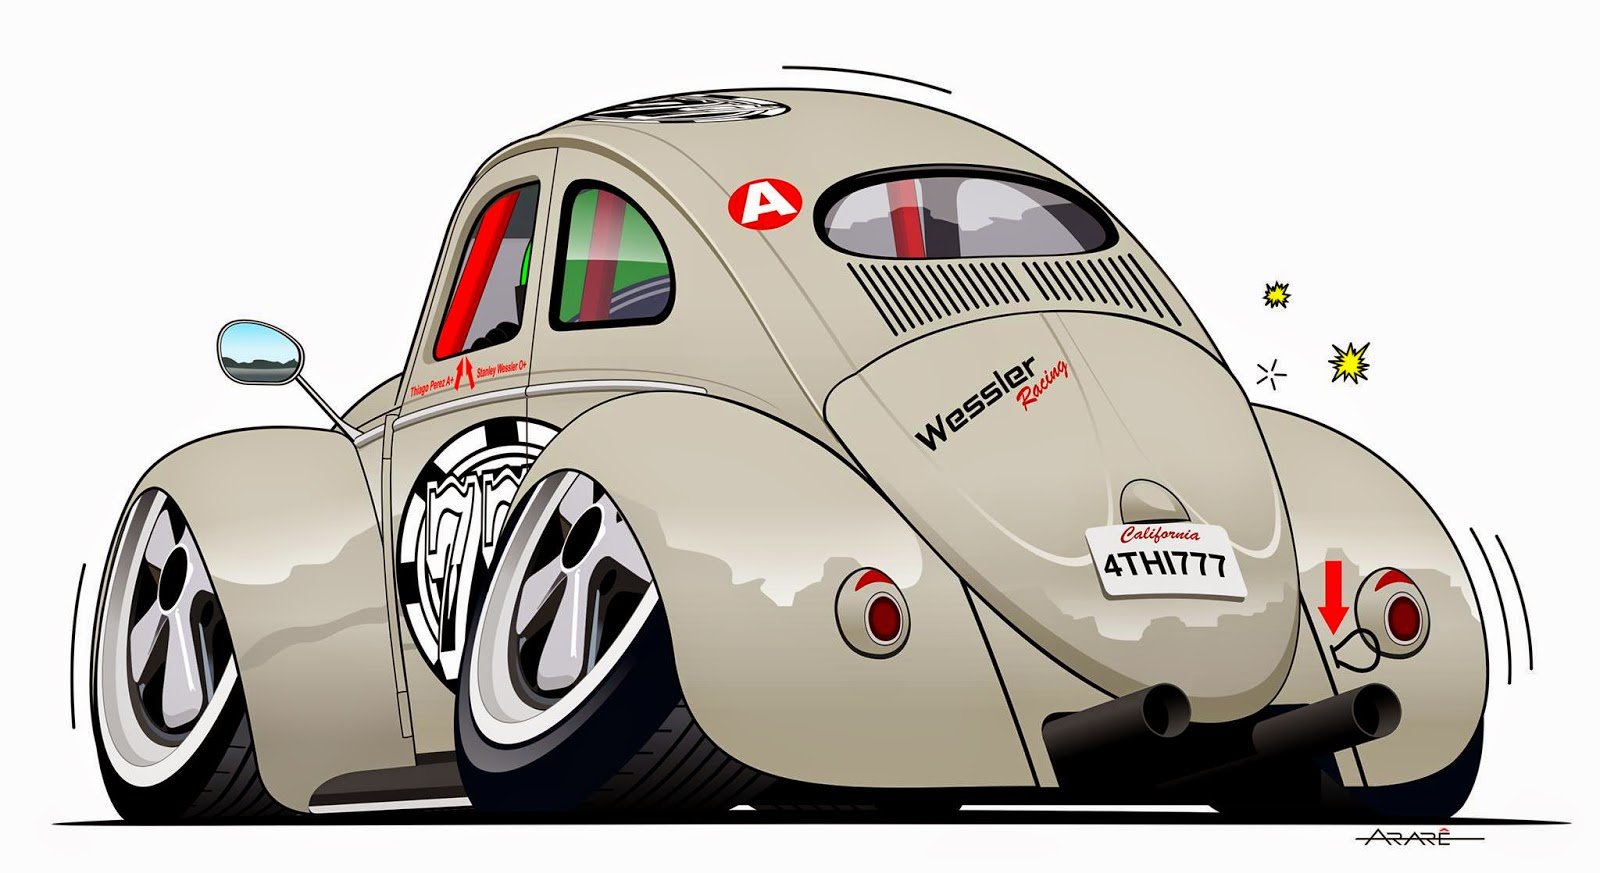 Excepcional The racing bugler! Blog do Lacombe: Espetáculo de carro, artista  LU77